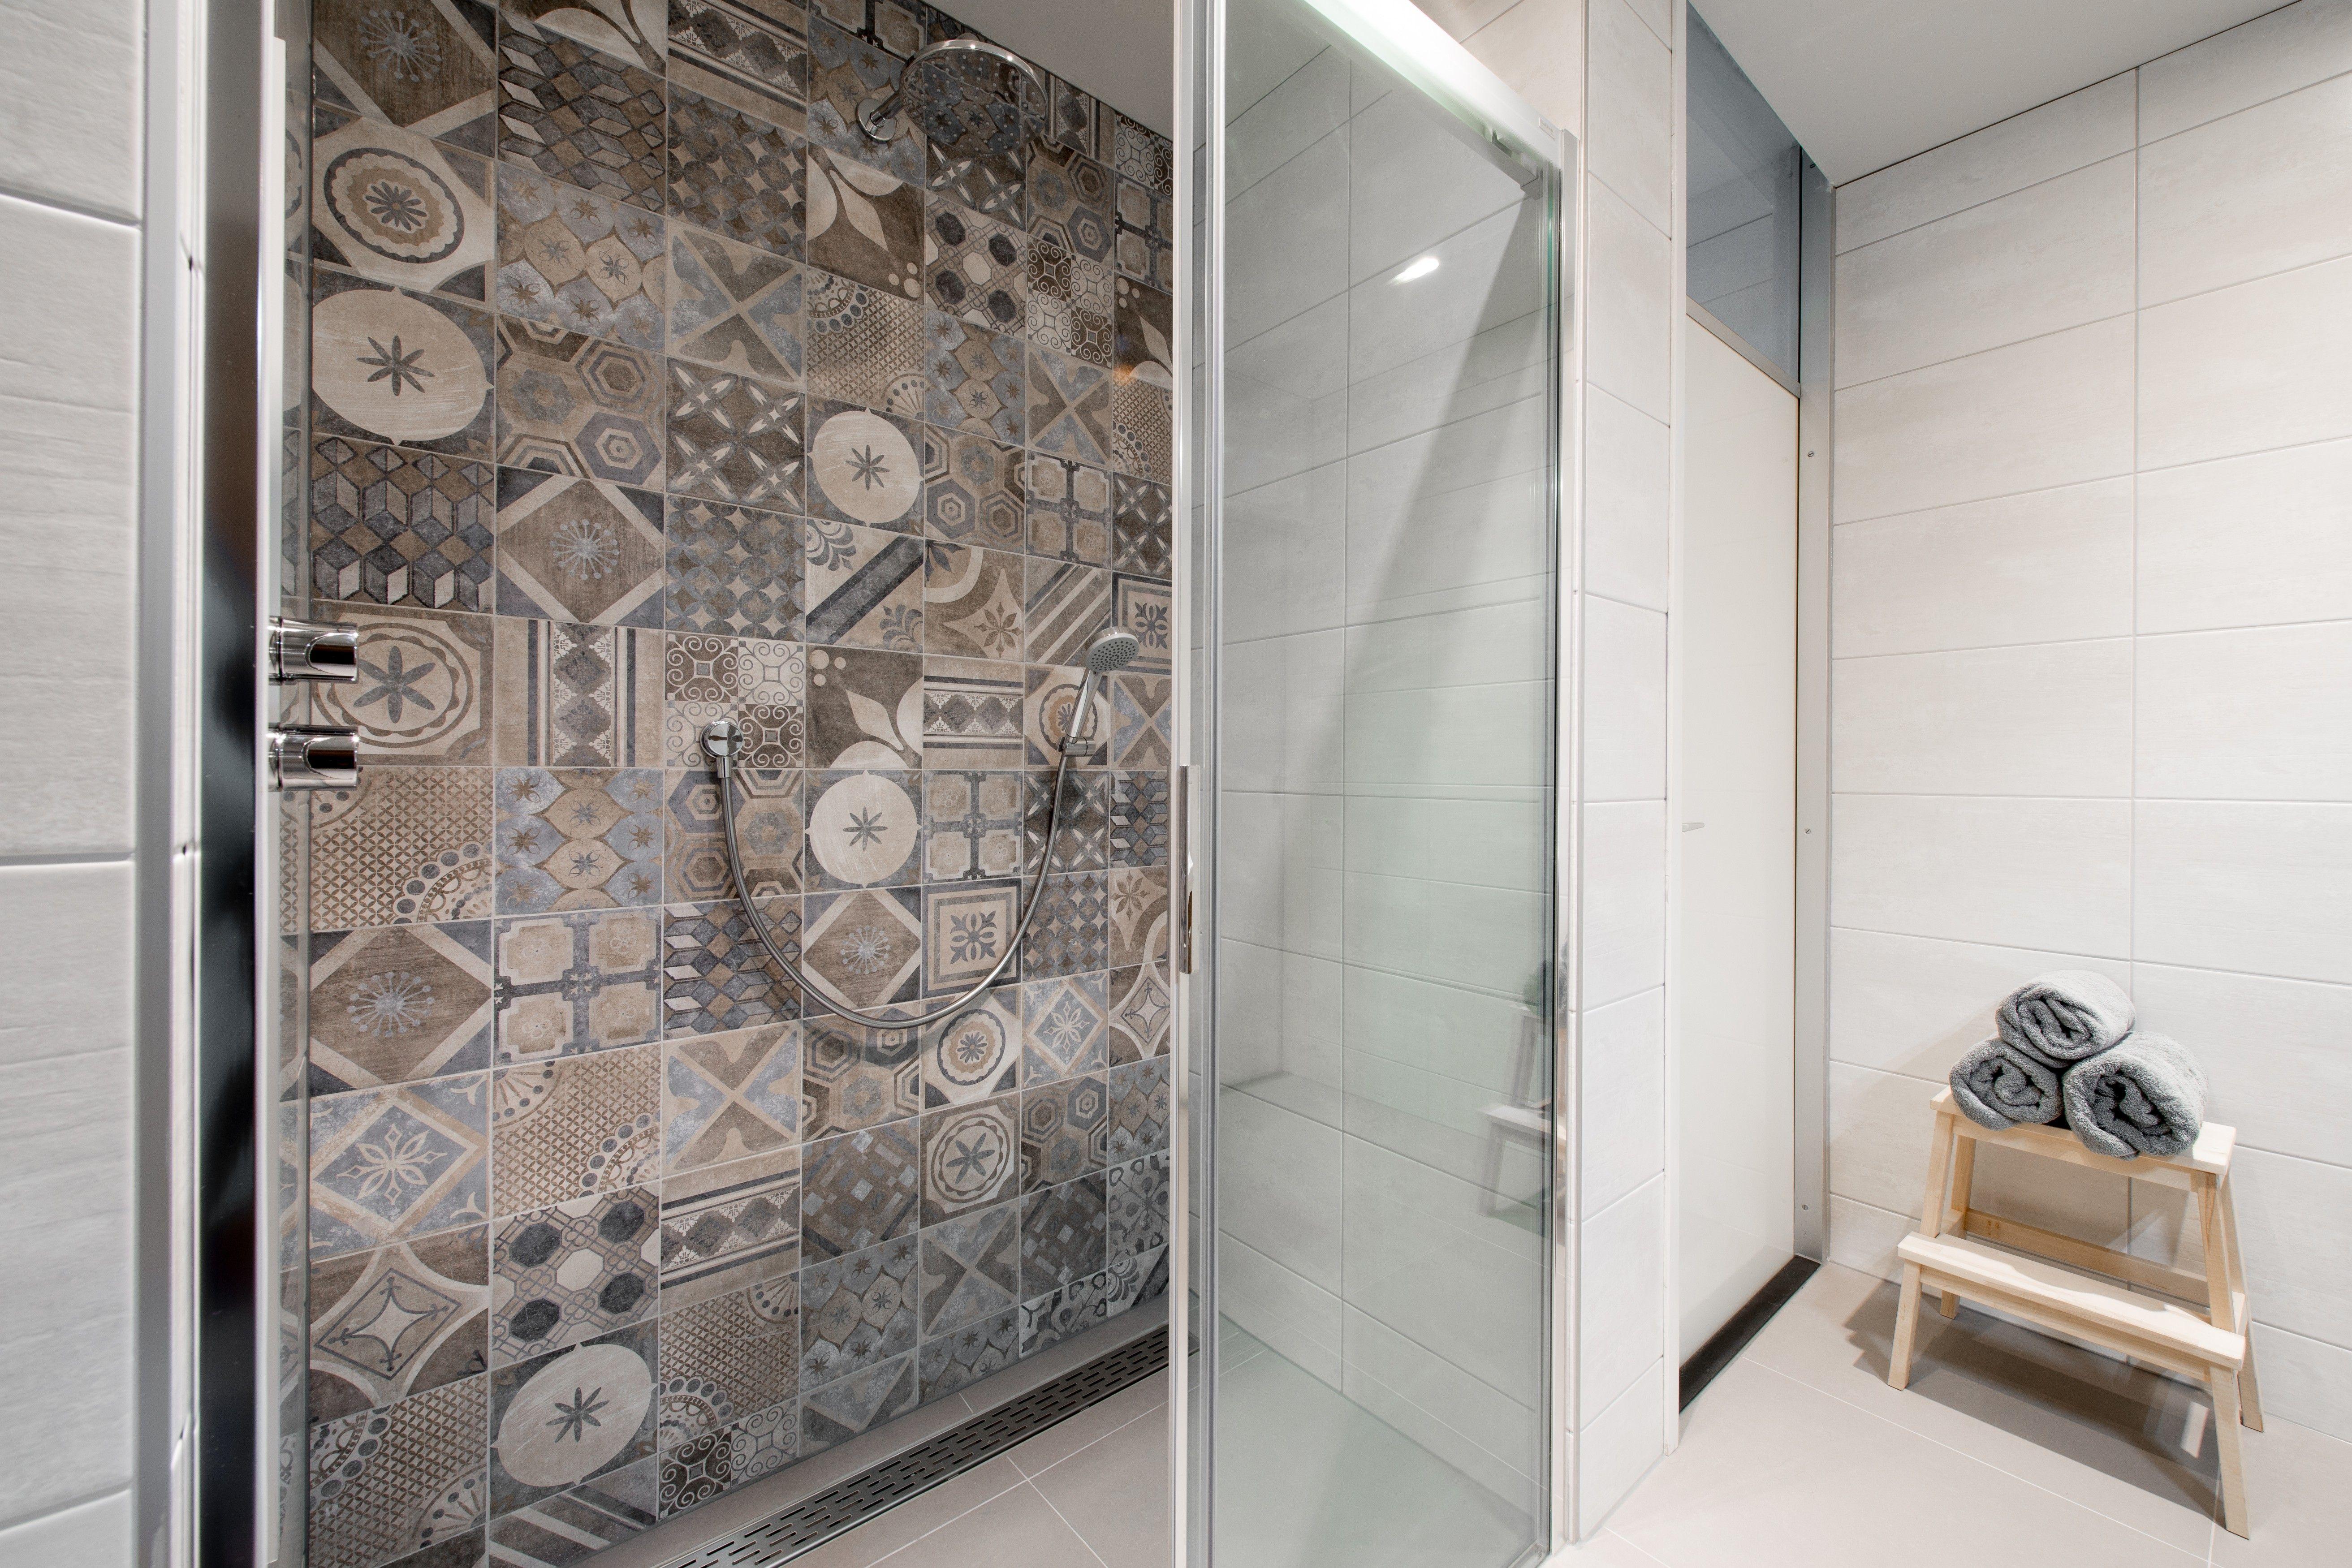 Warme landelijke badkamer - Houten wastafelonderkast - Sunshower ...